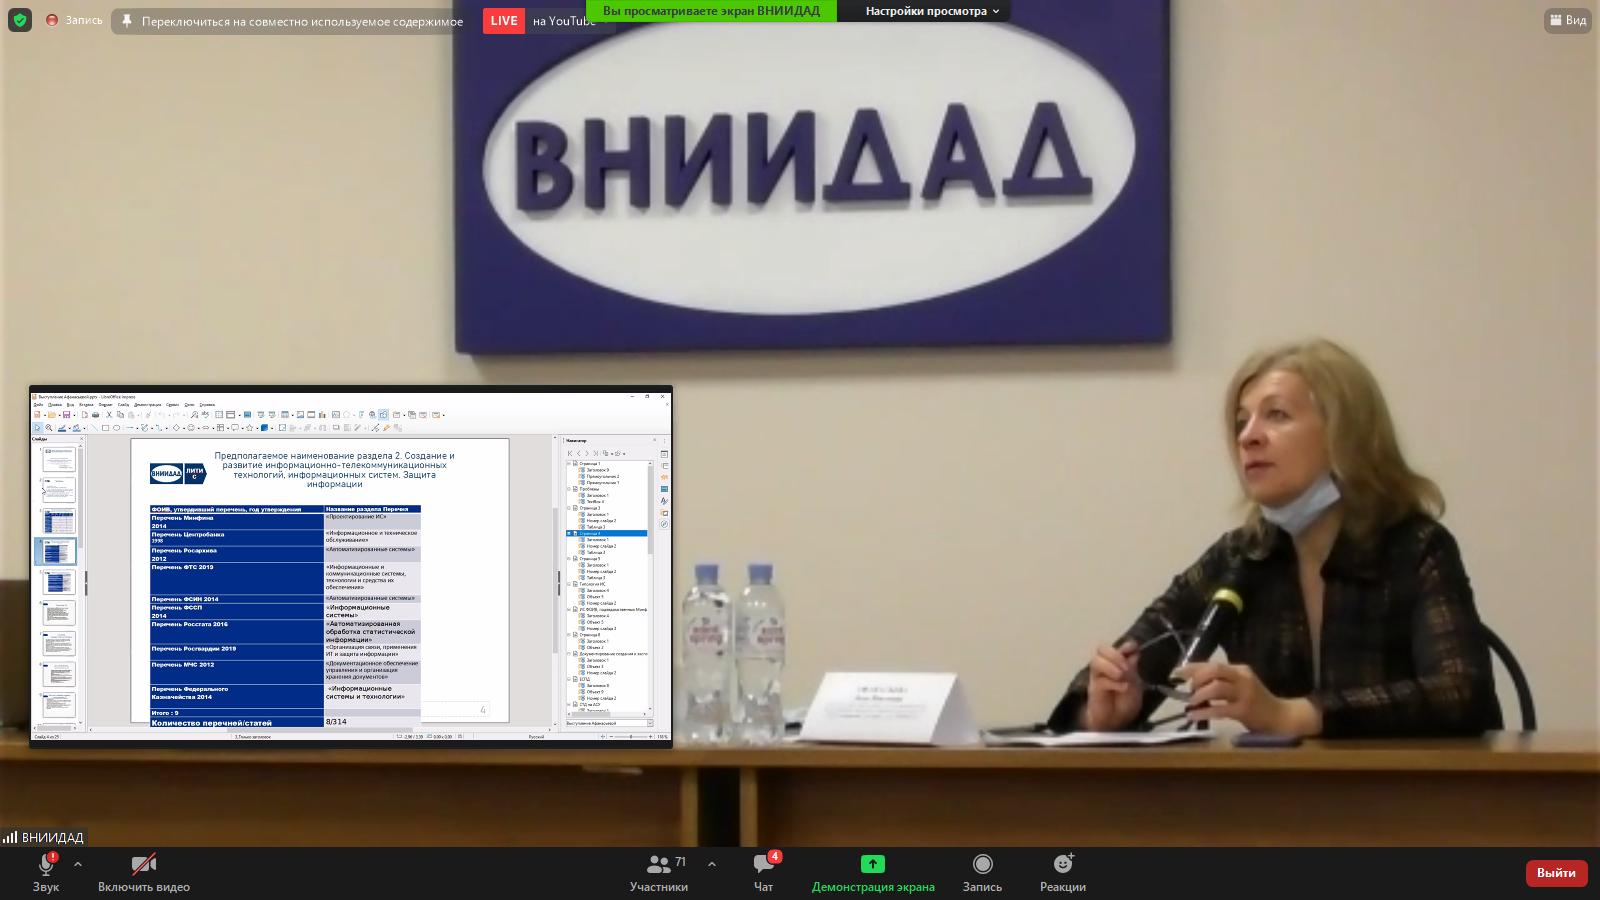 Афанасьева Лада Павловна, канд. ист. наук, заведующий отделом архивоведения ВНИИДАД.